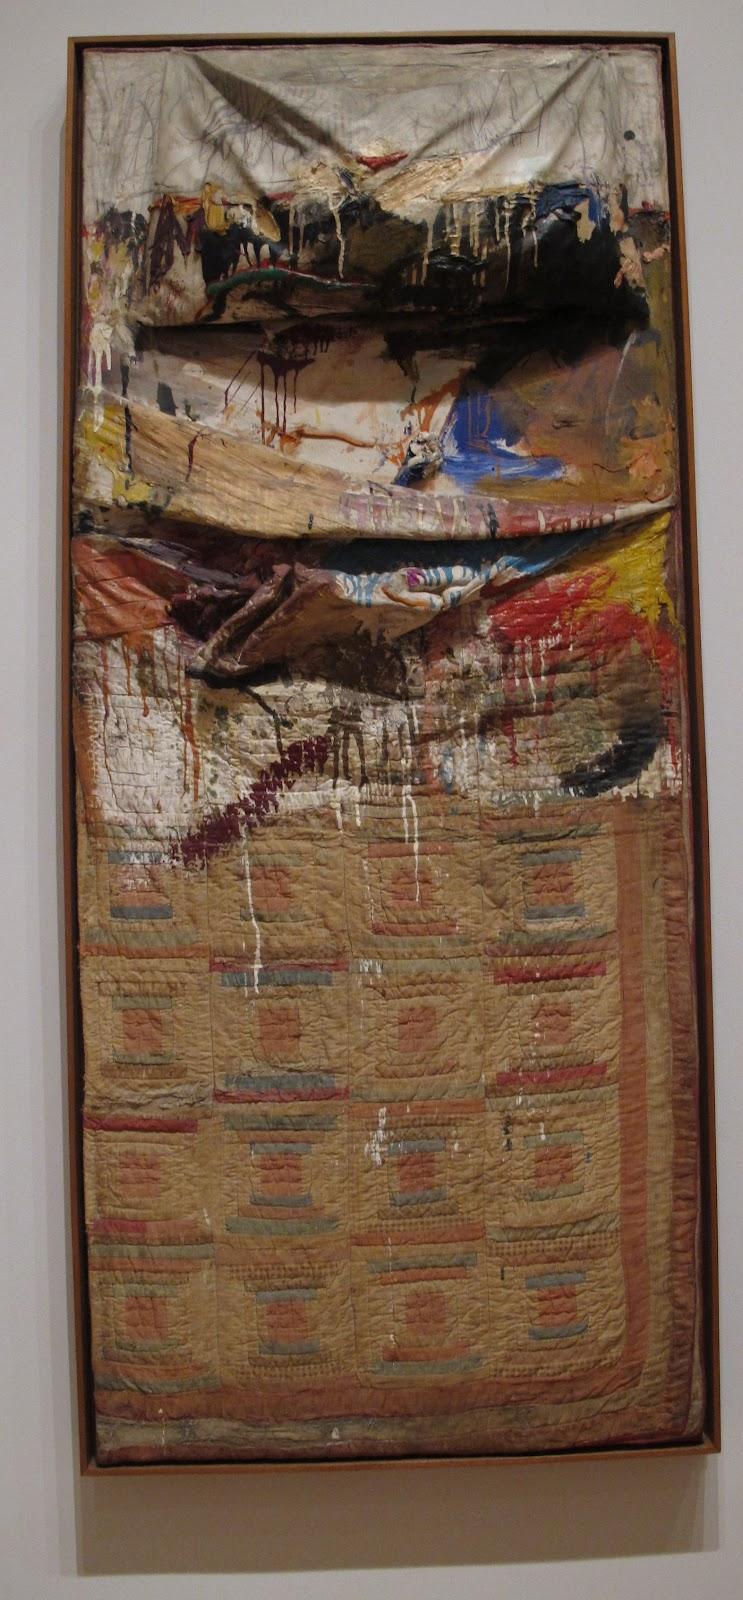 Judith I Bridgland Favourite Paintings Rauschenberg S